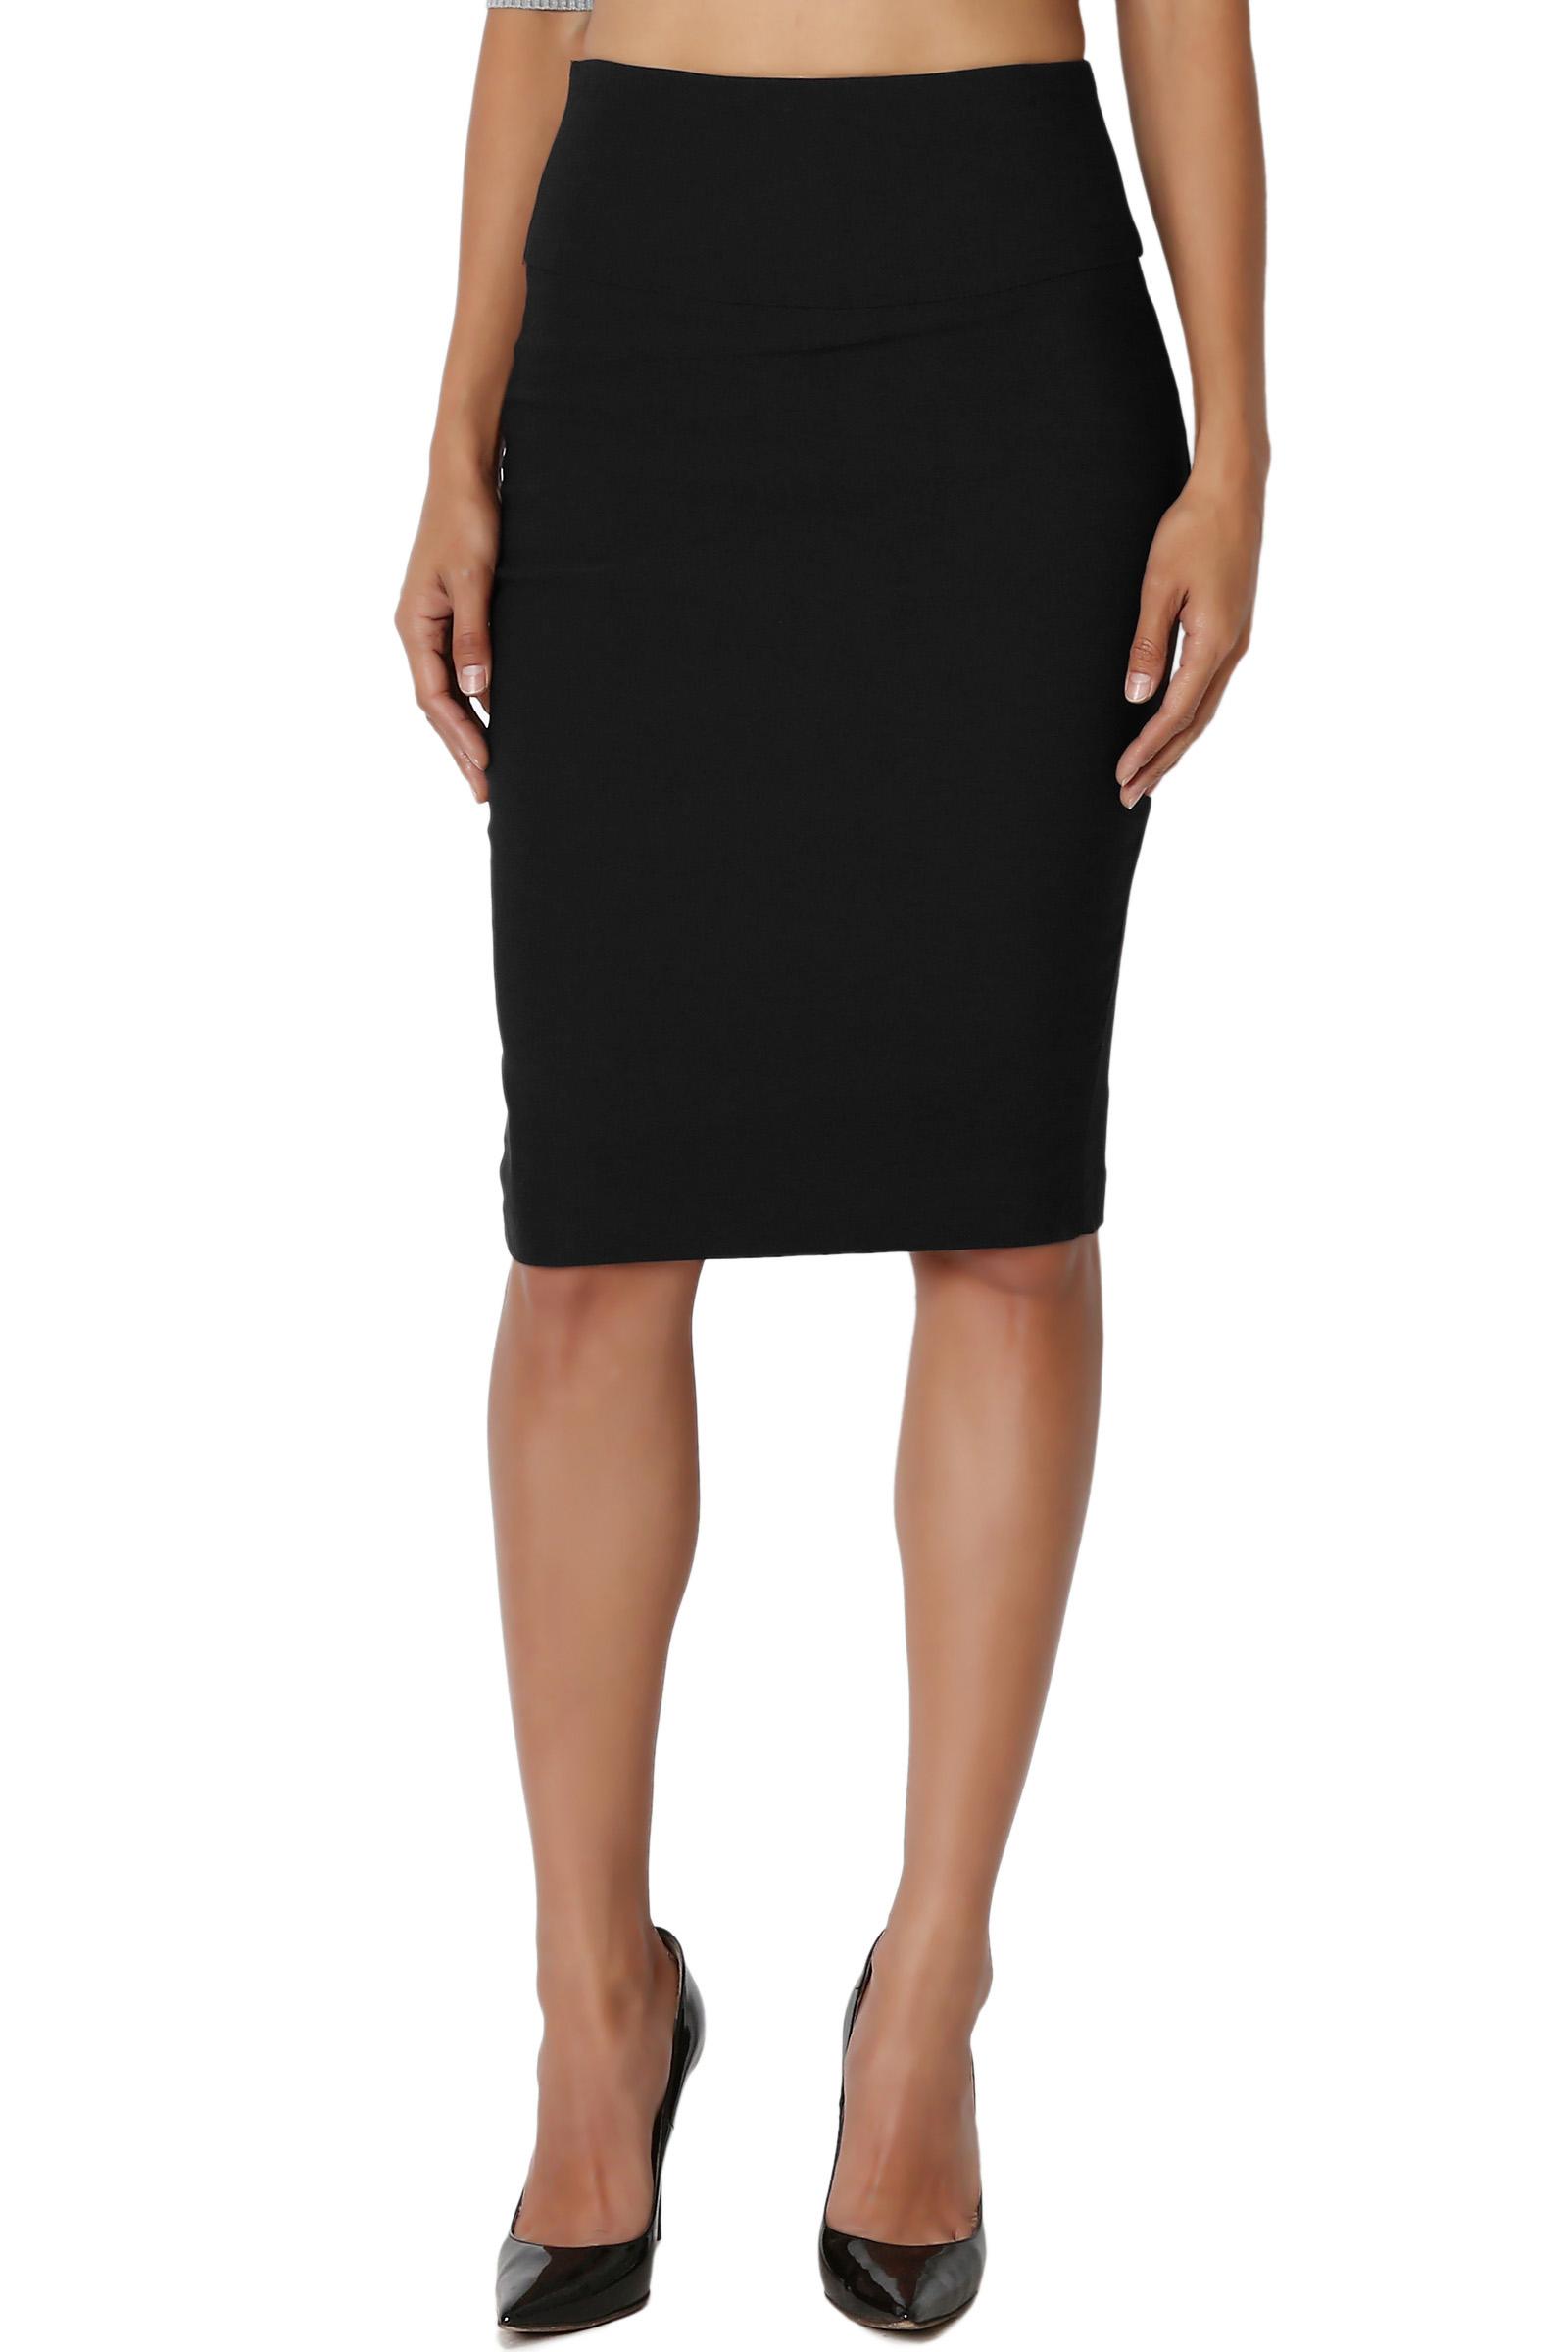 TheMogan Junior's S~3X High Waist Stretch Woven Casual to Formal Pencil Midi Skirt